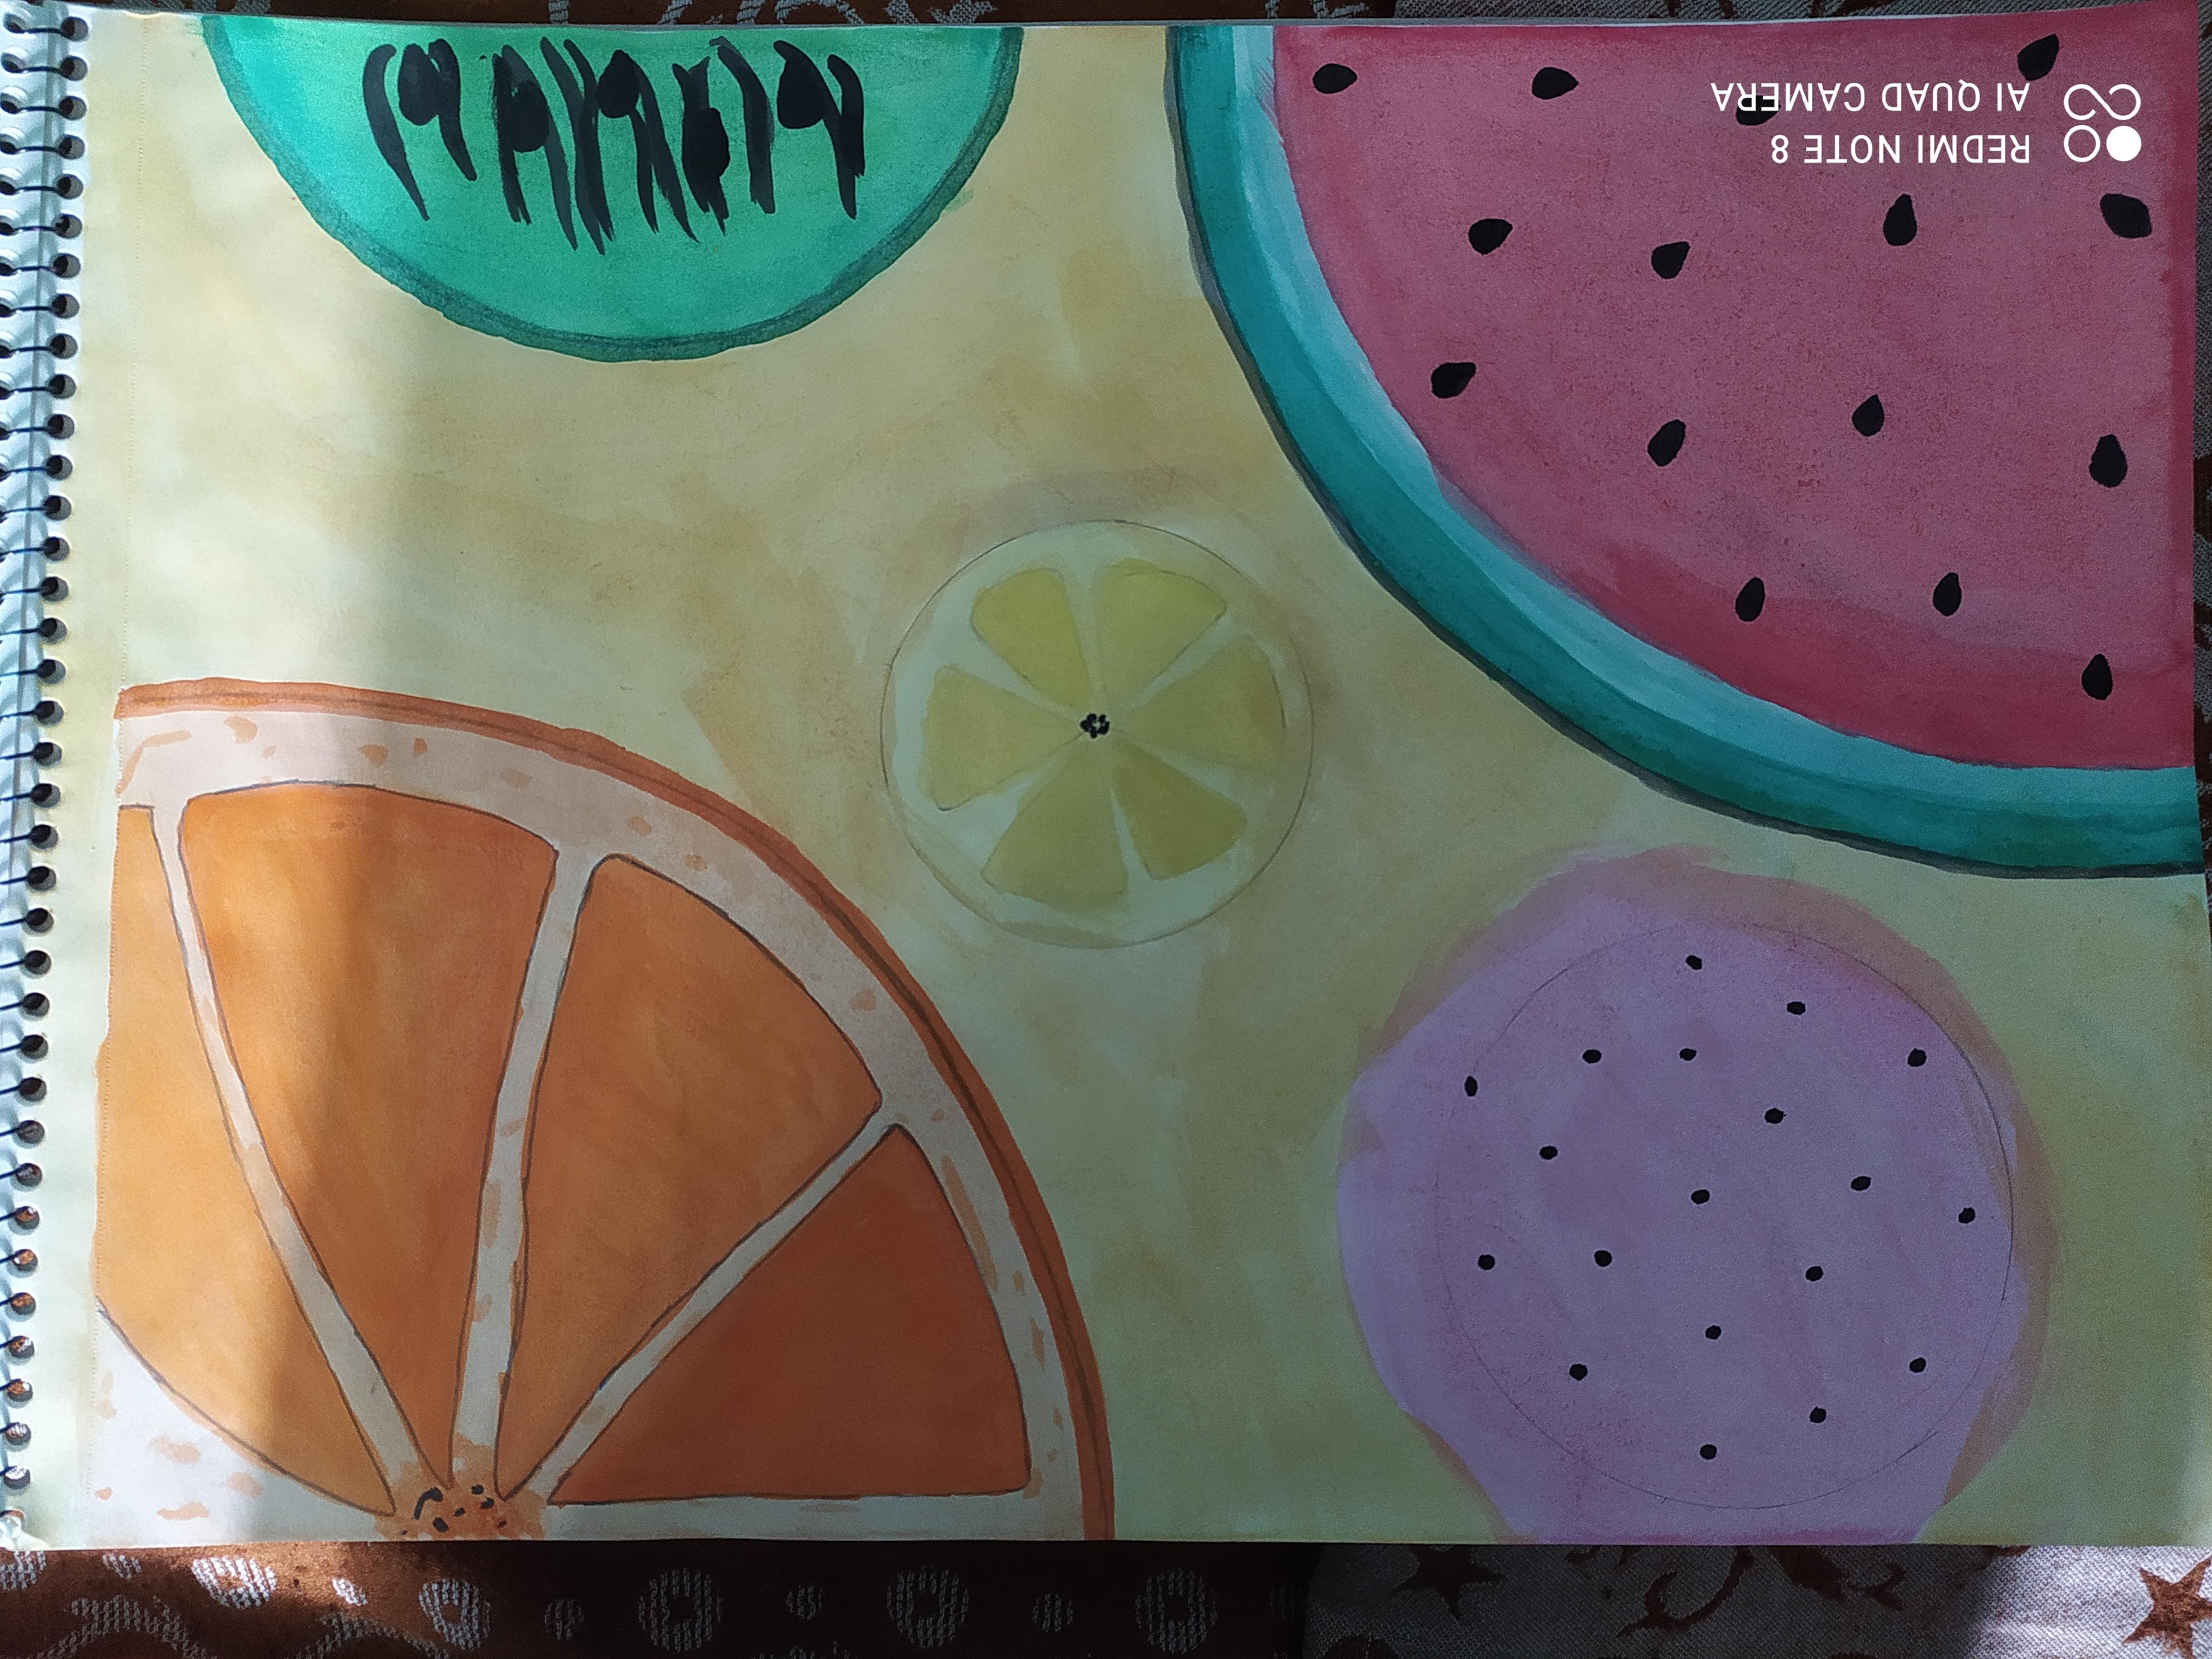 Hansini's Painting 'My Fruits Gallery'